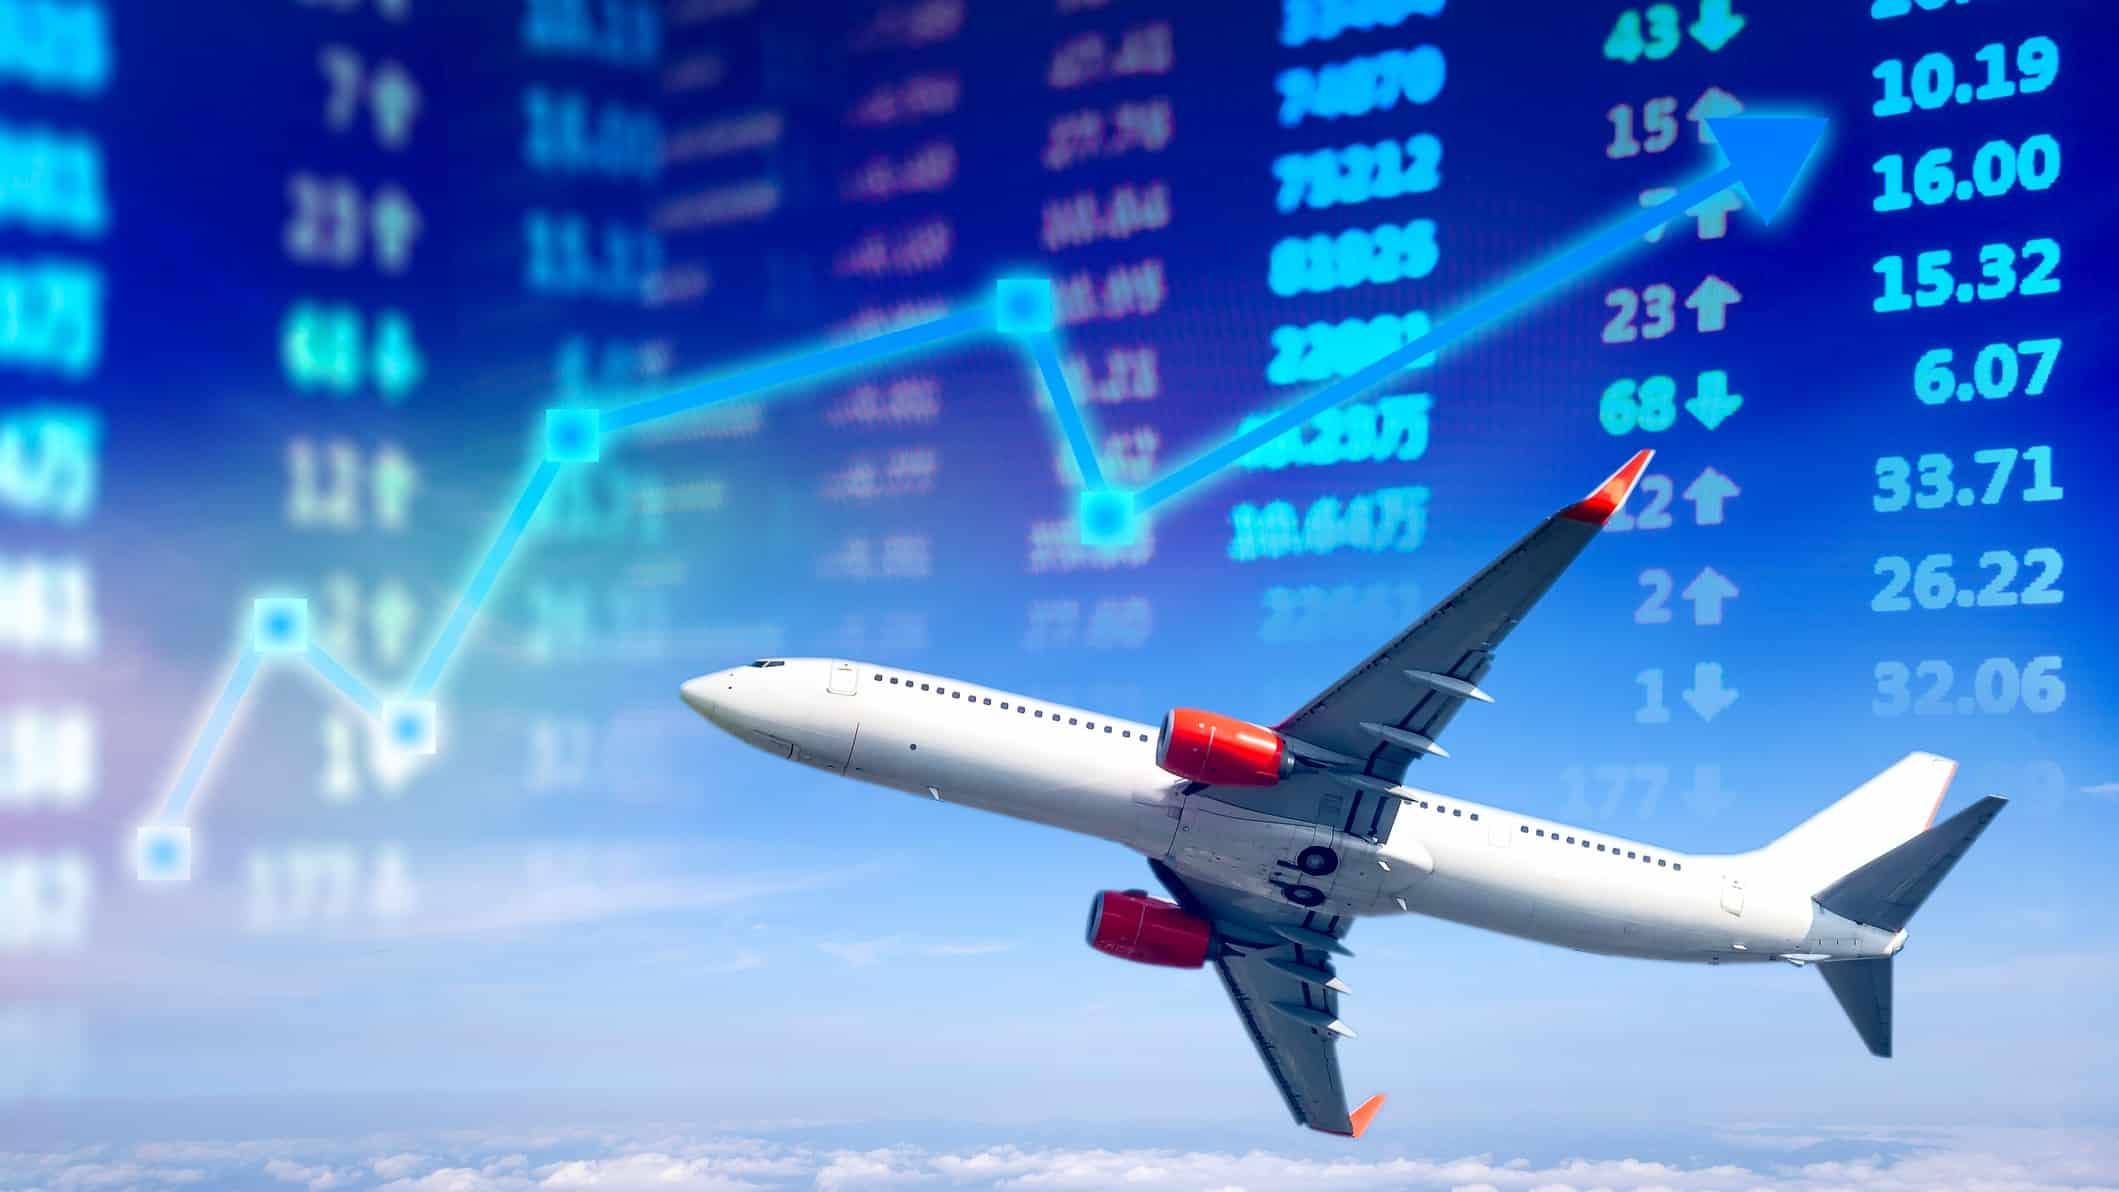 plane flying across share markey graph, asx 200 travel shares, qantas share price